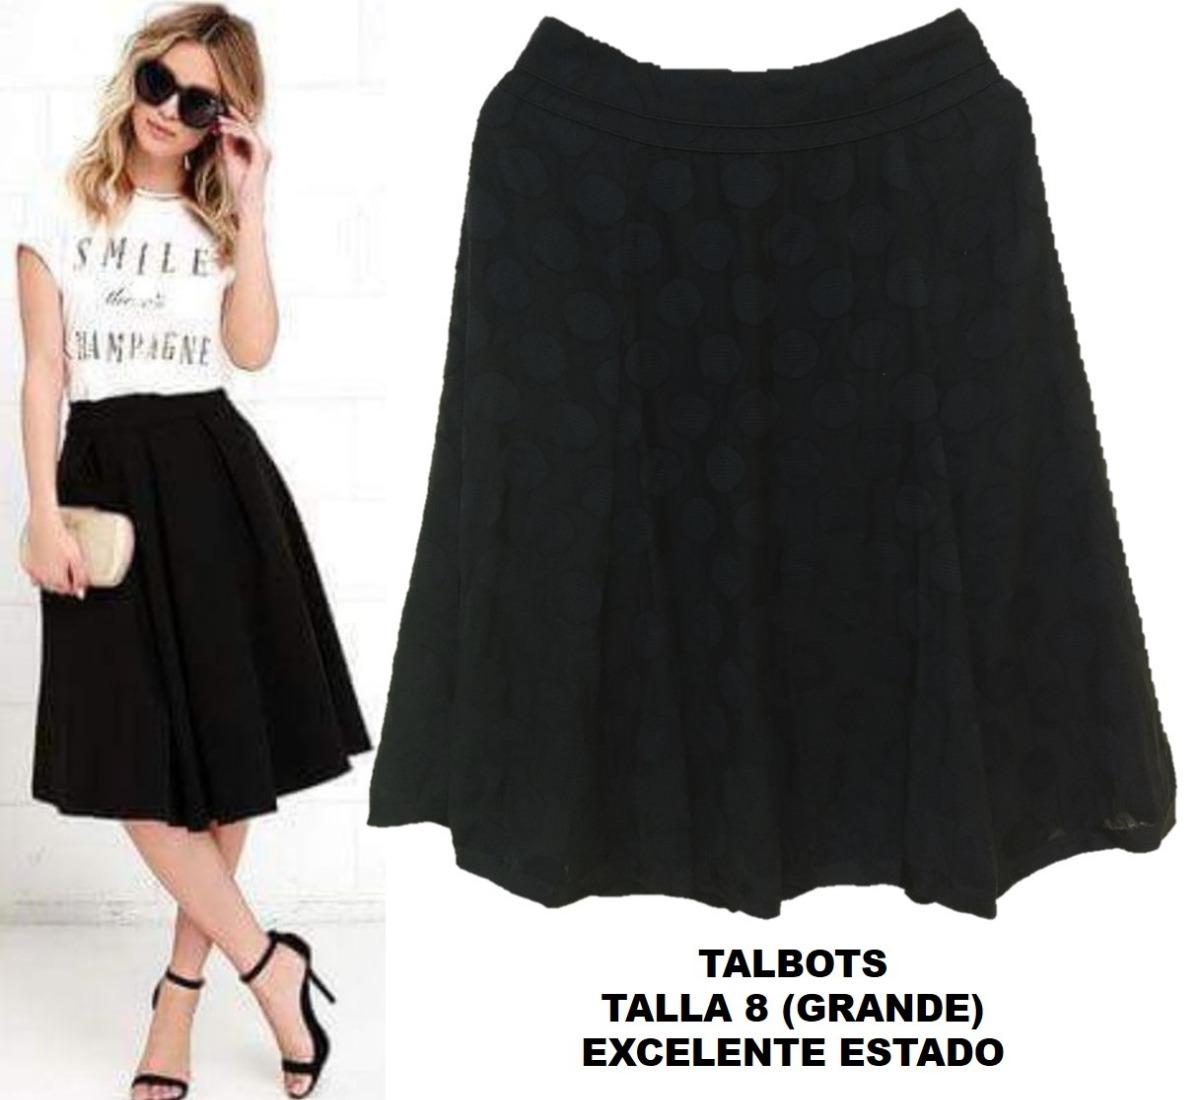 bec46997fa falda midi negra talbots grande forro garage bazarhadasa. Cargando zoom.